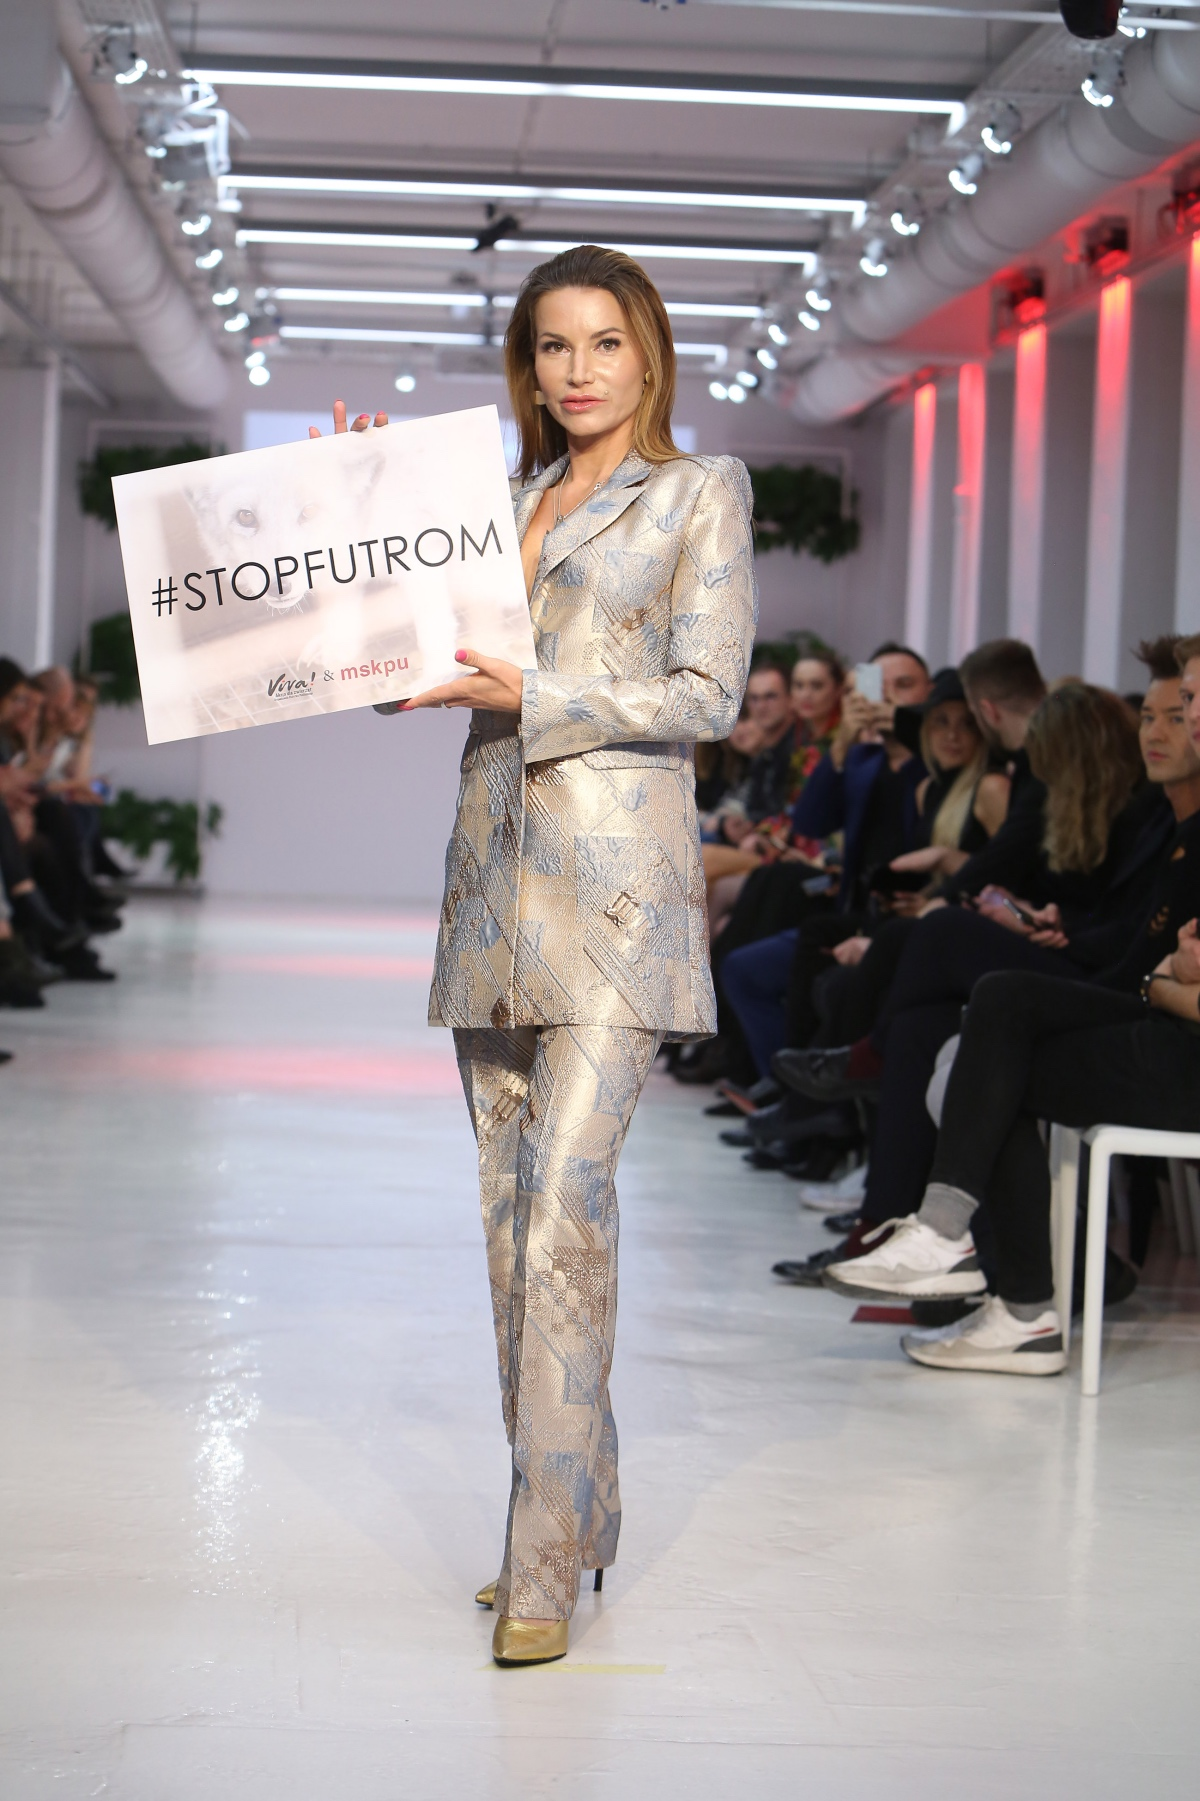 BlogStar: #stopfutrom - BlogStar.pl